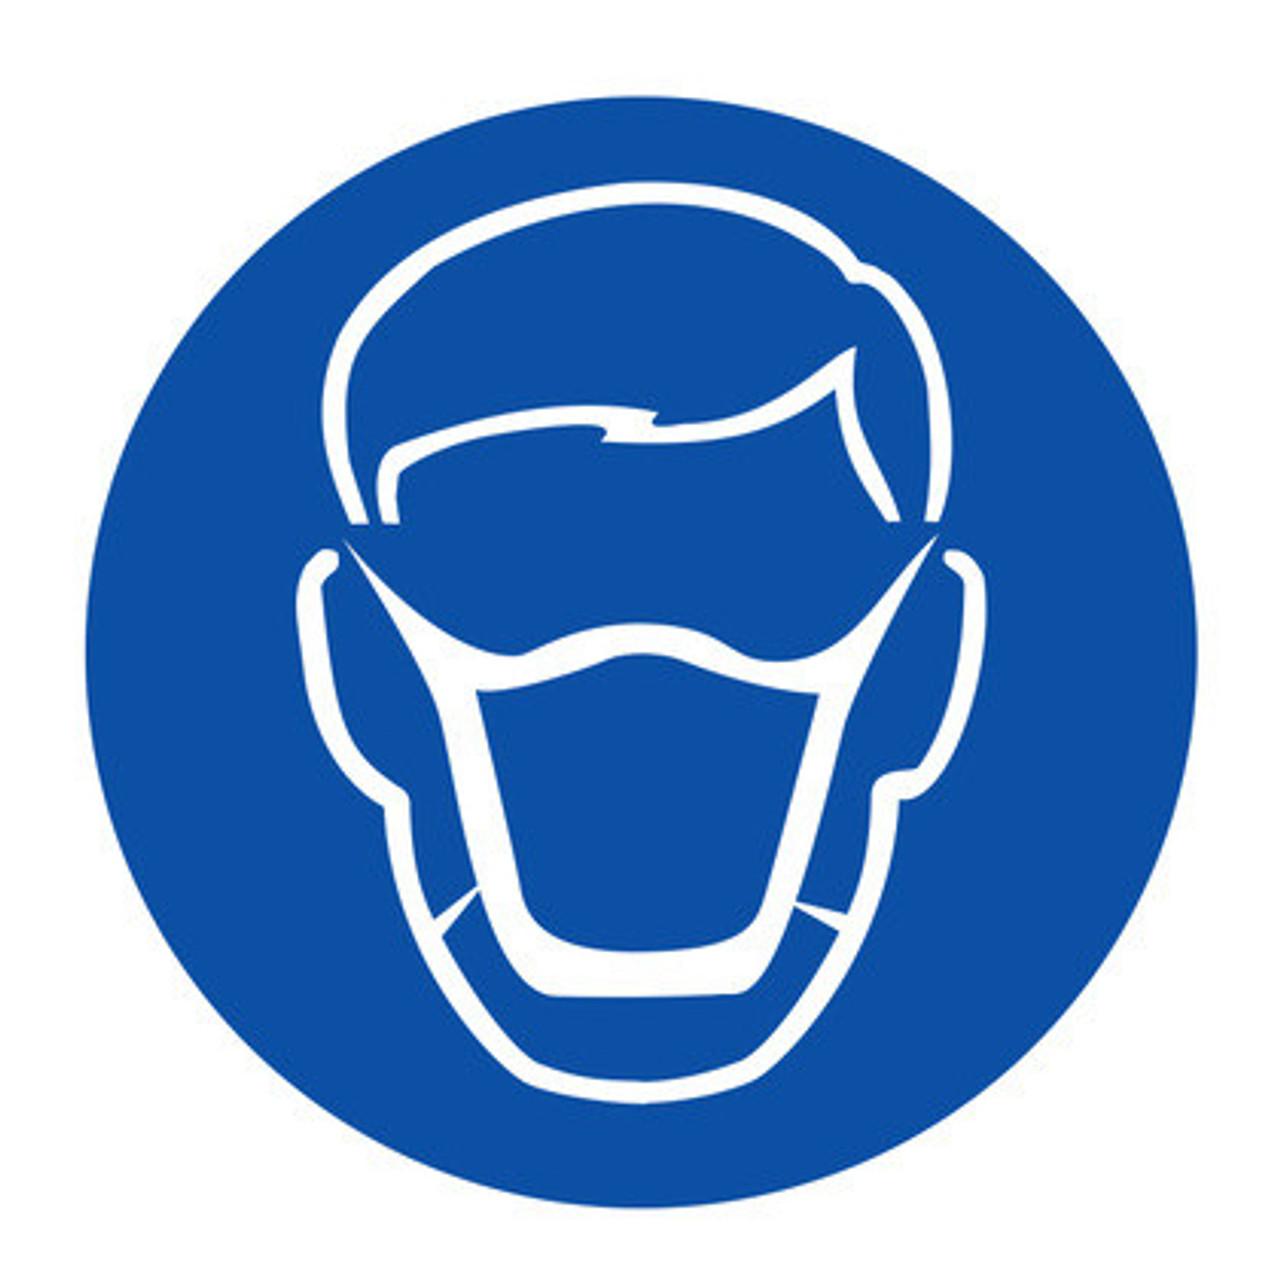 Respiratory Protection Mask Symbol Vinyl 10cm